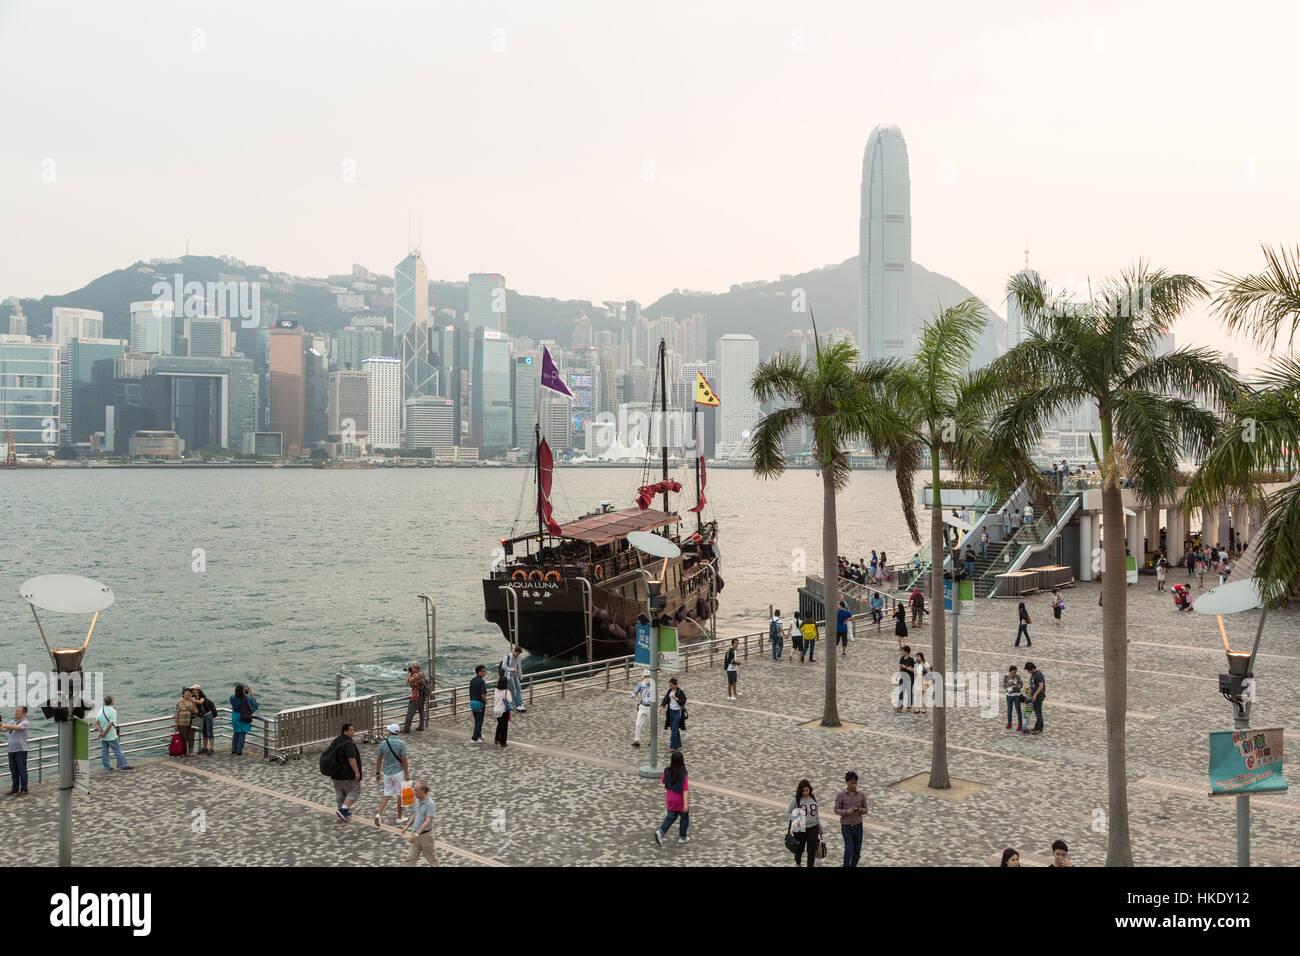 Hong Kong, Hong Kong - April 26 2015: Tourists take pictures and enjoy the famous Hong Kong island skyline across Stock Photo